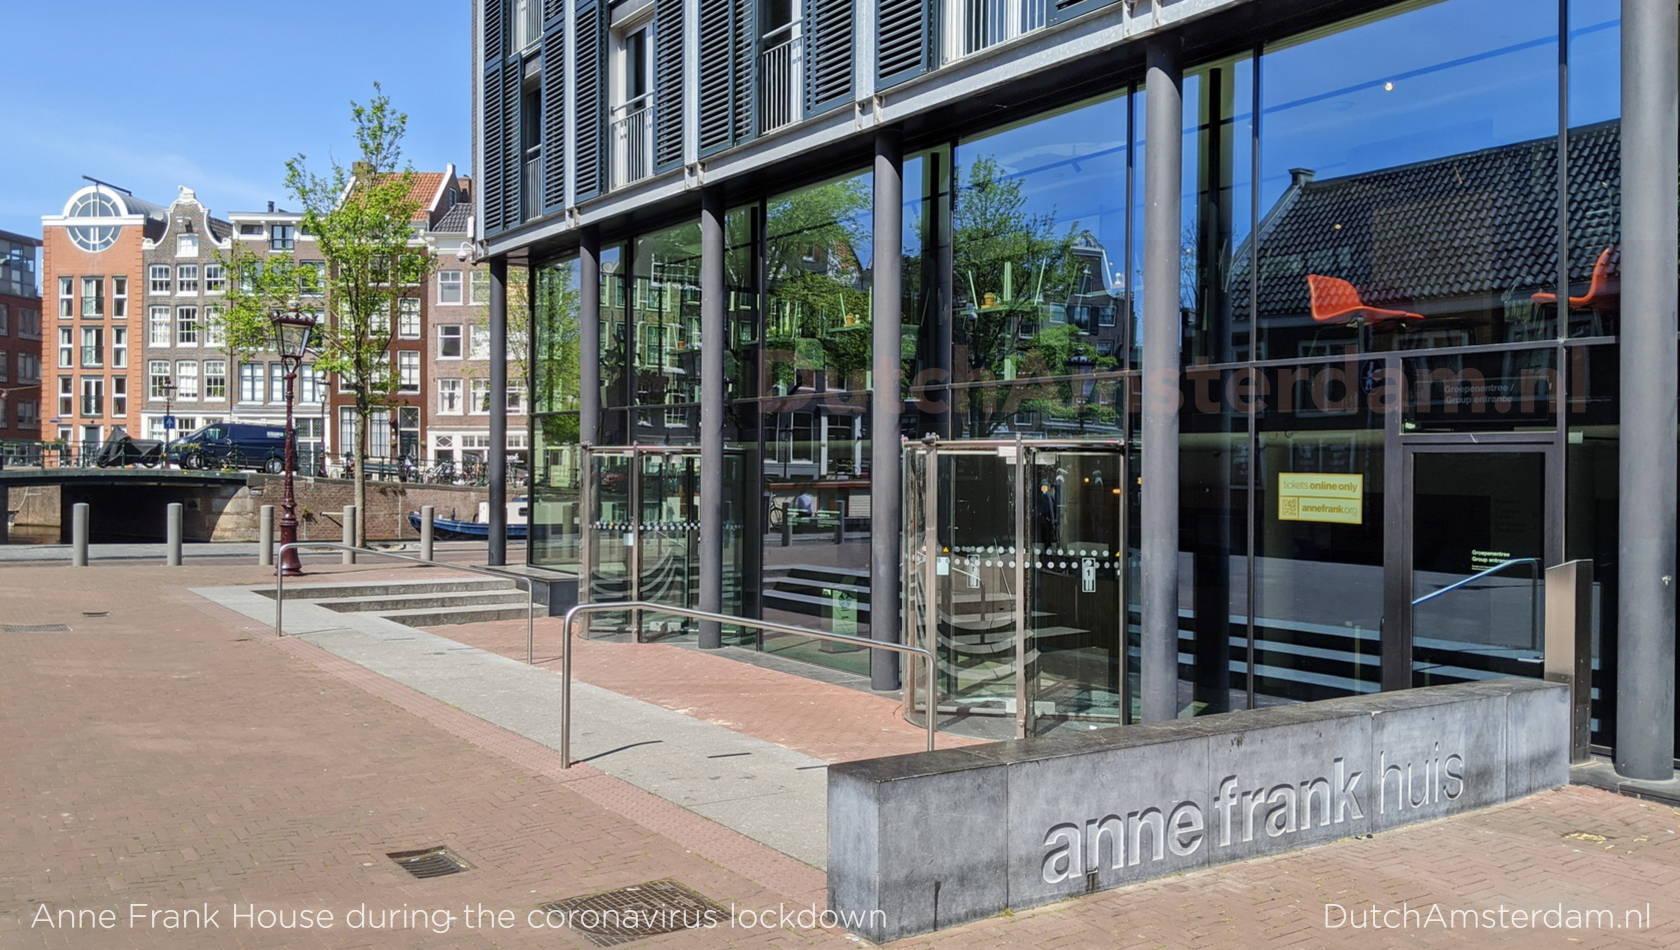 Anne Frank House during the Coronavirus crisis